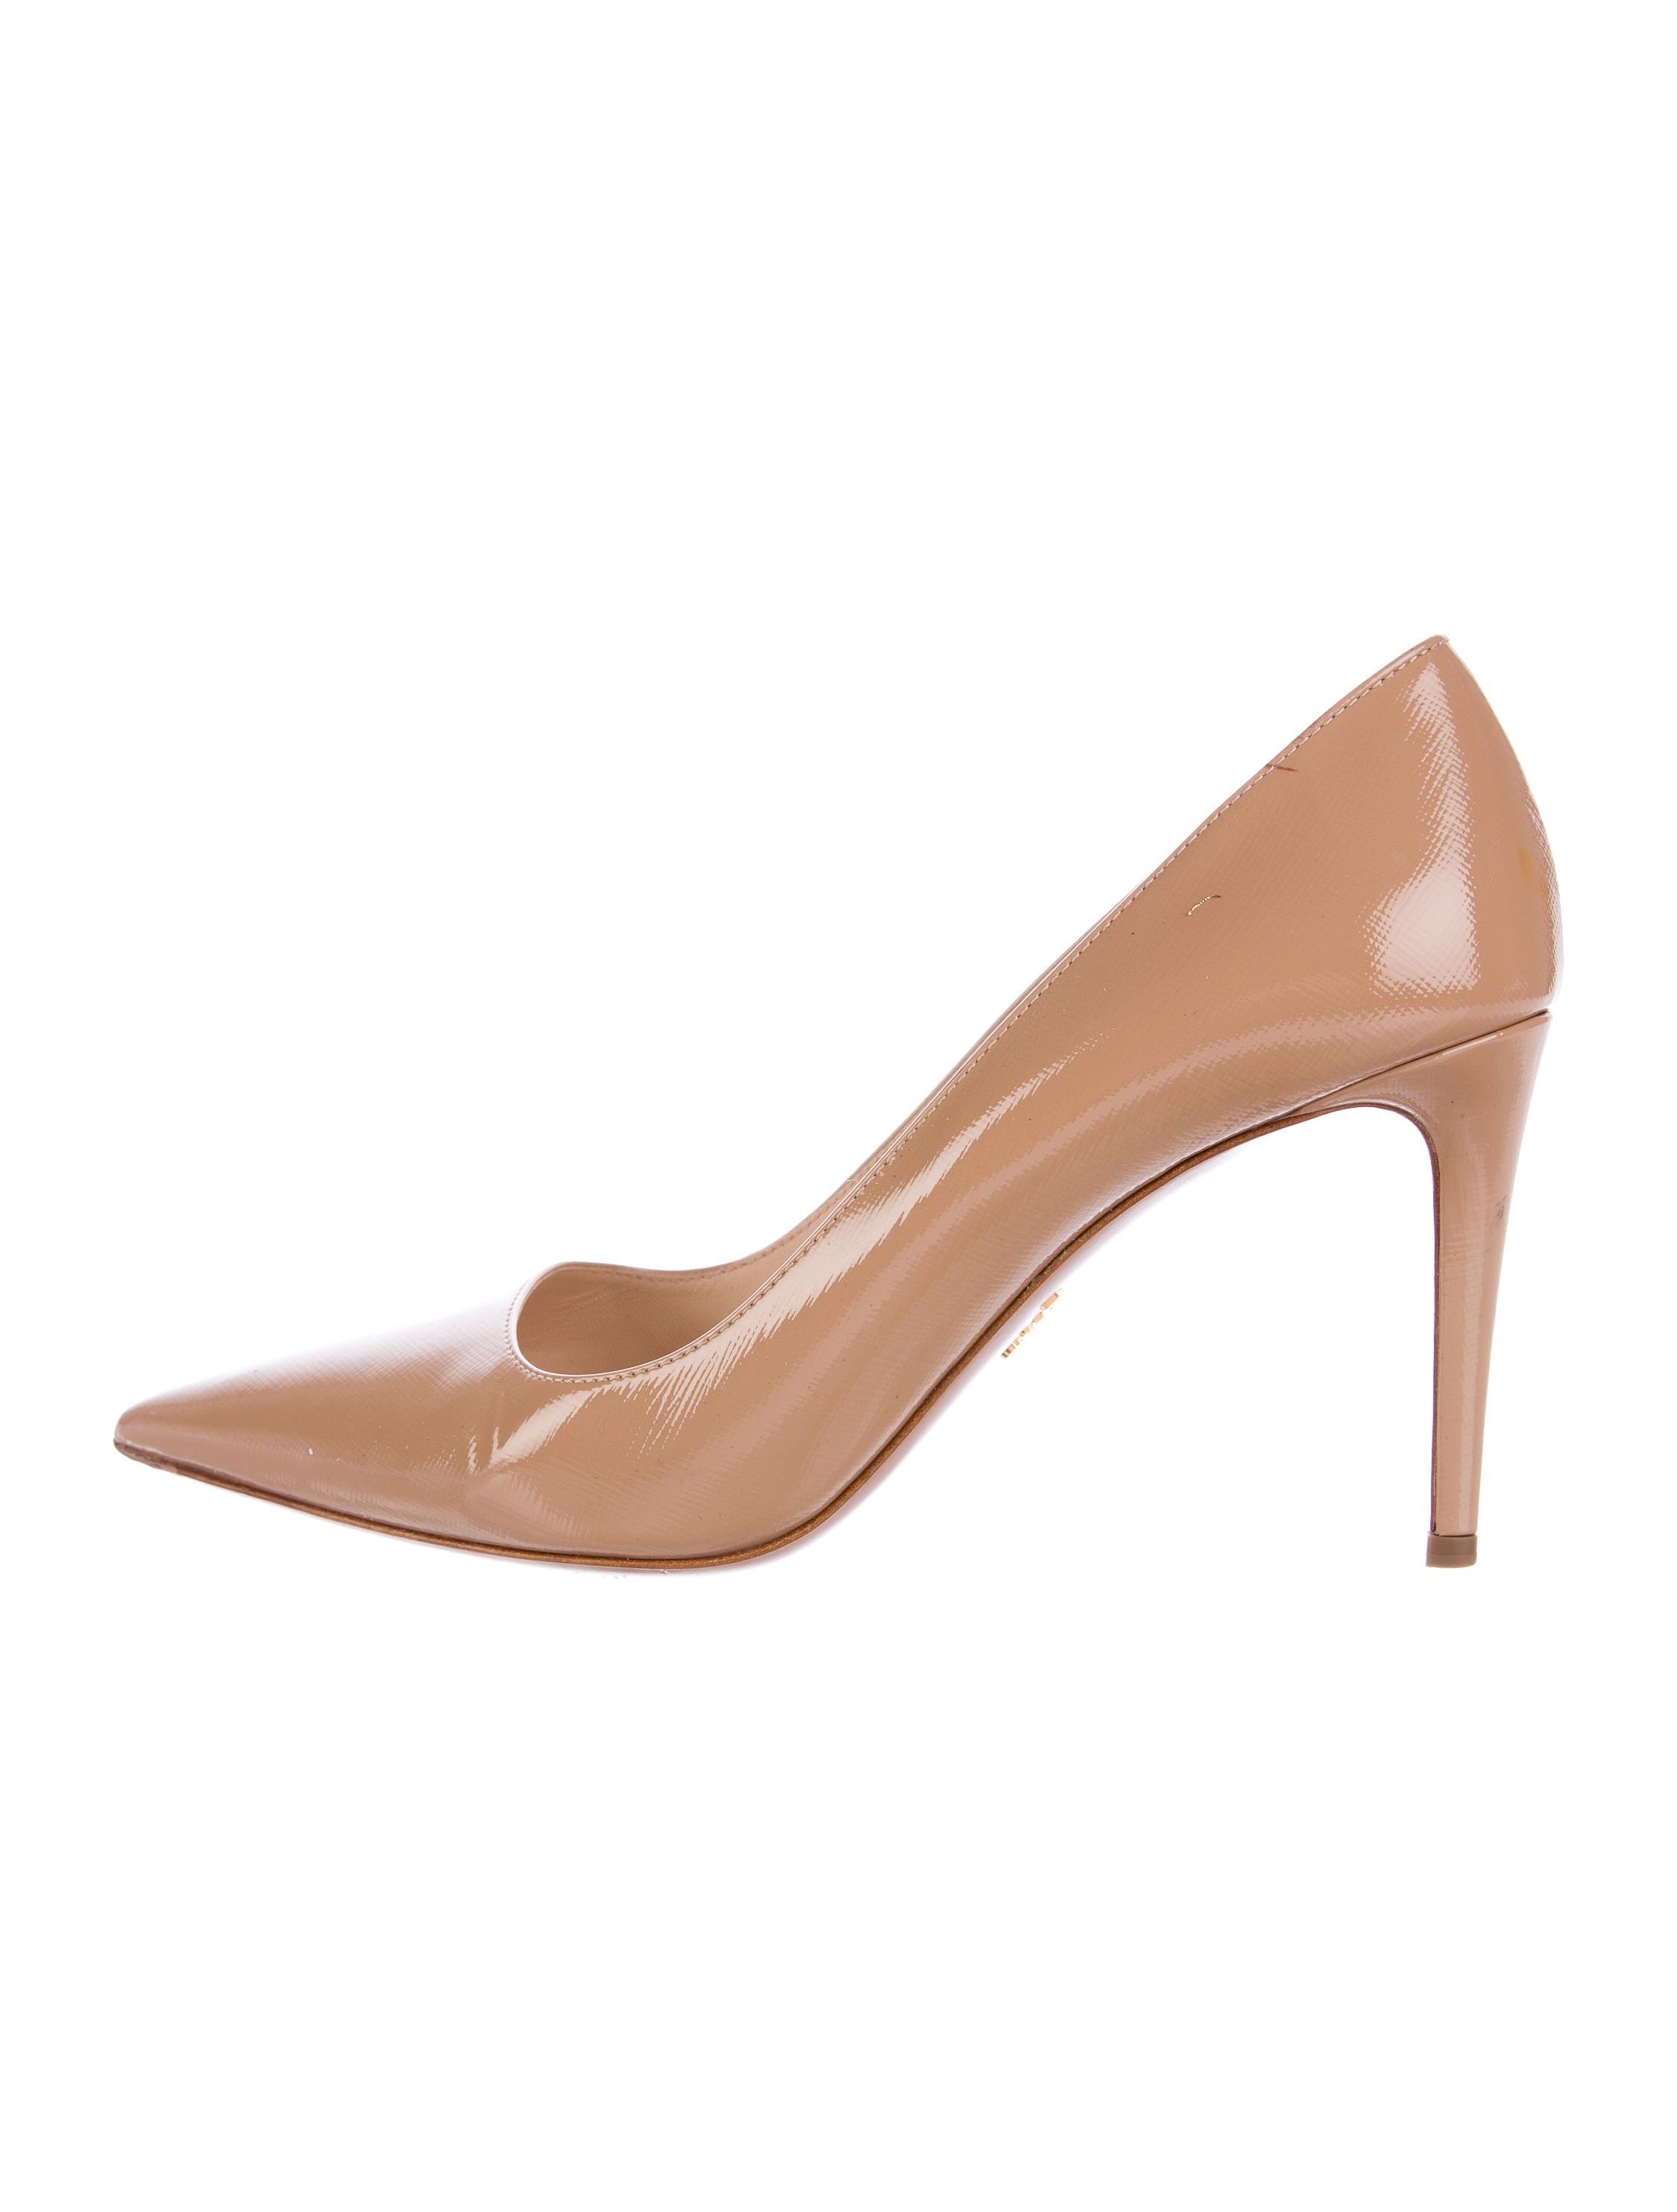 9327ca215cd0 Prada Saffiano Leather Pointed-Toe Pumps - Shoes - PRA140313